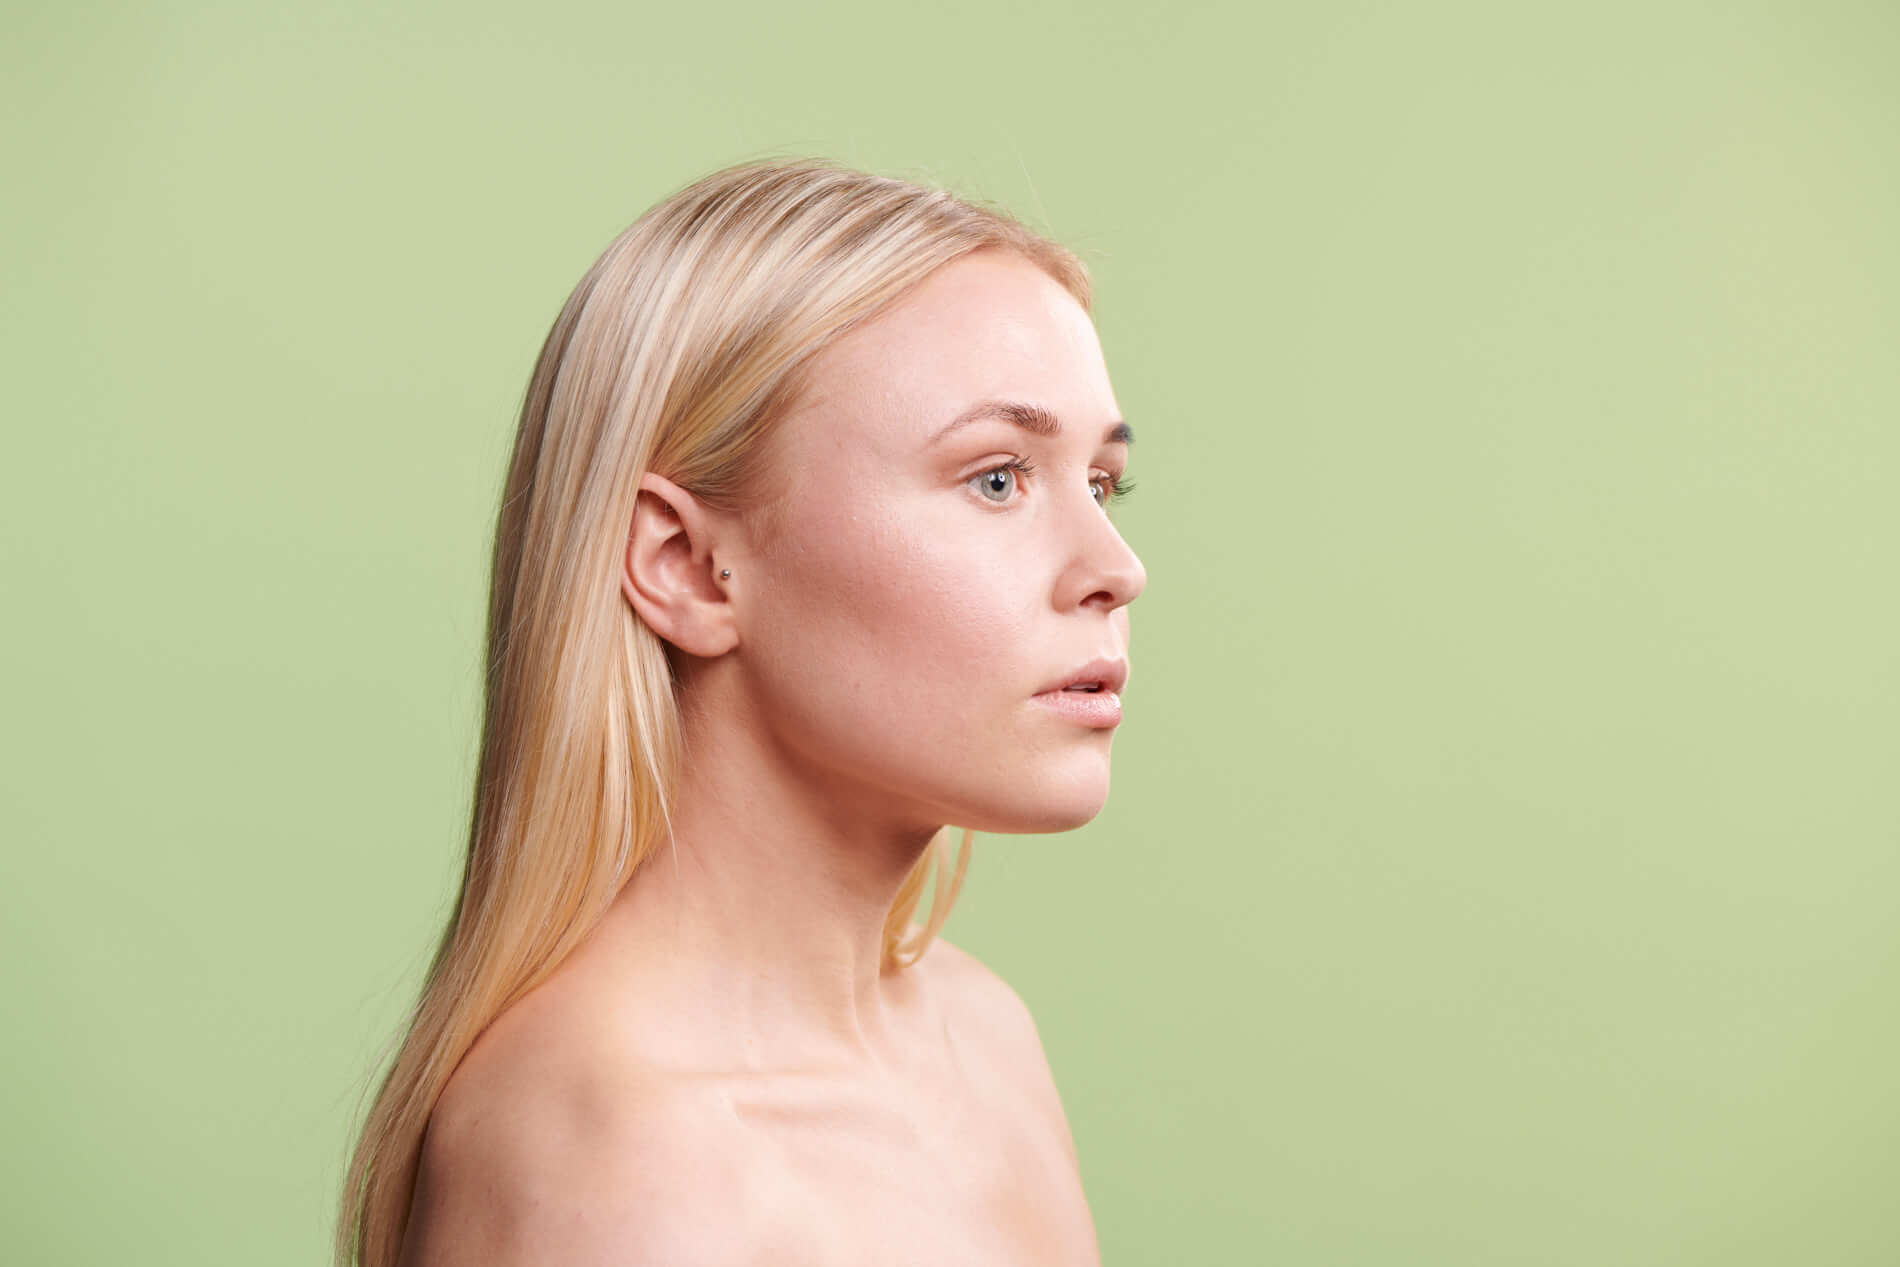 Skin Concerns - Acne Treatment